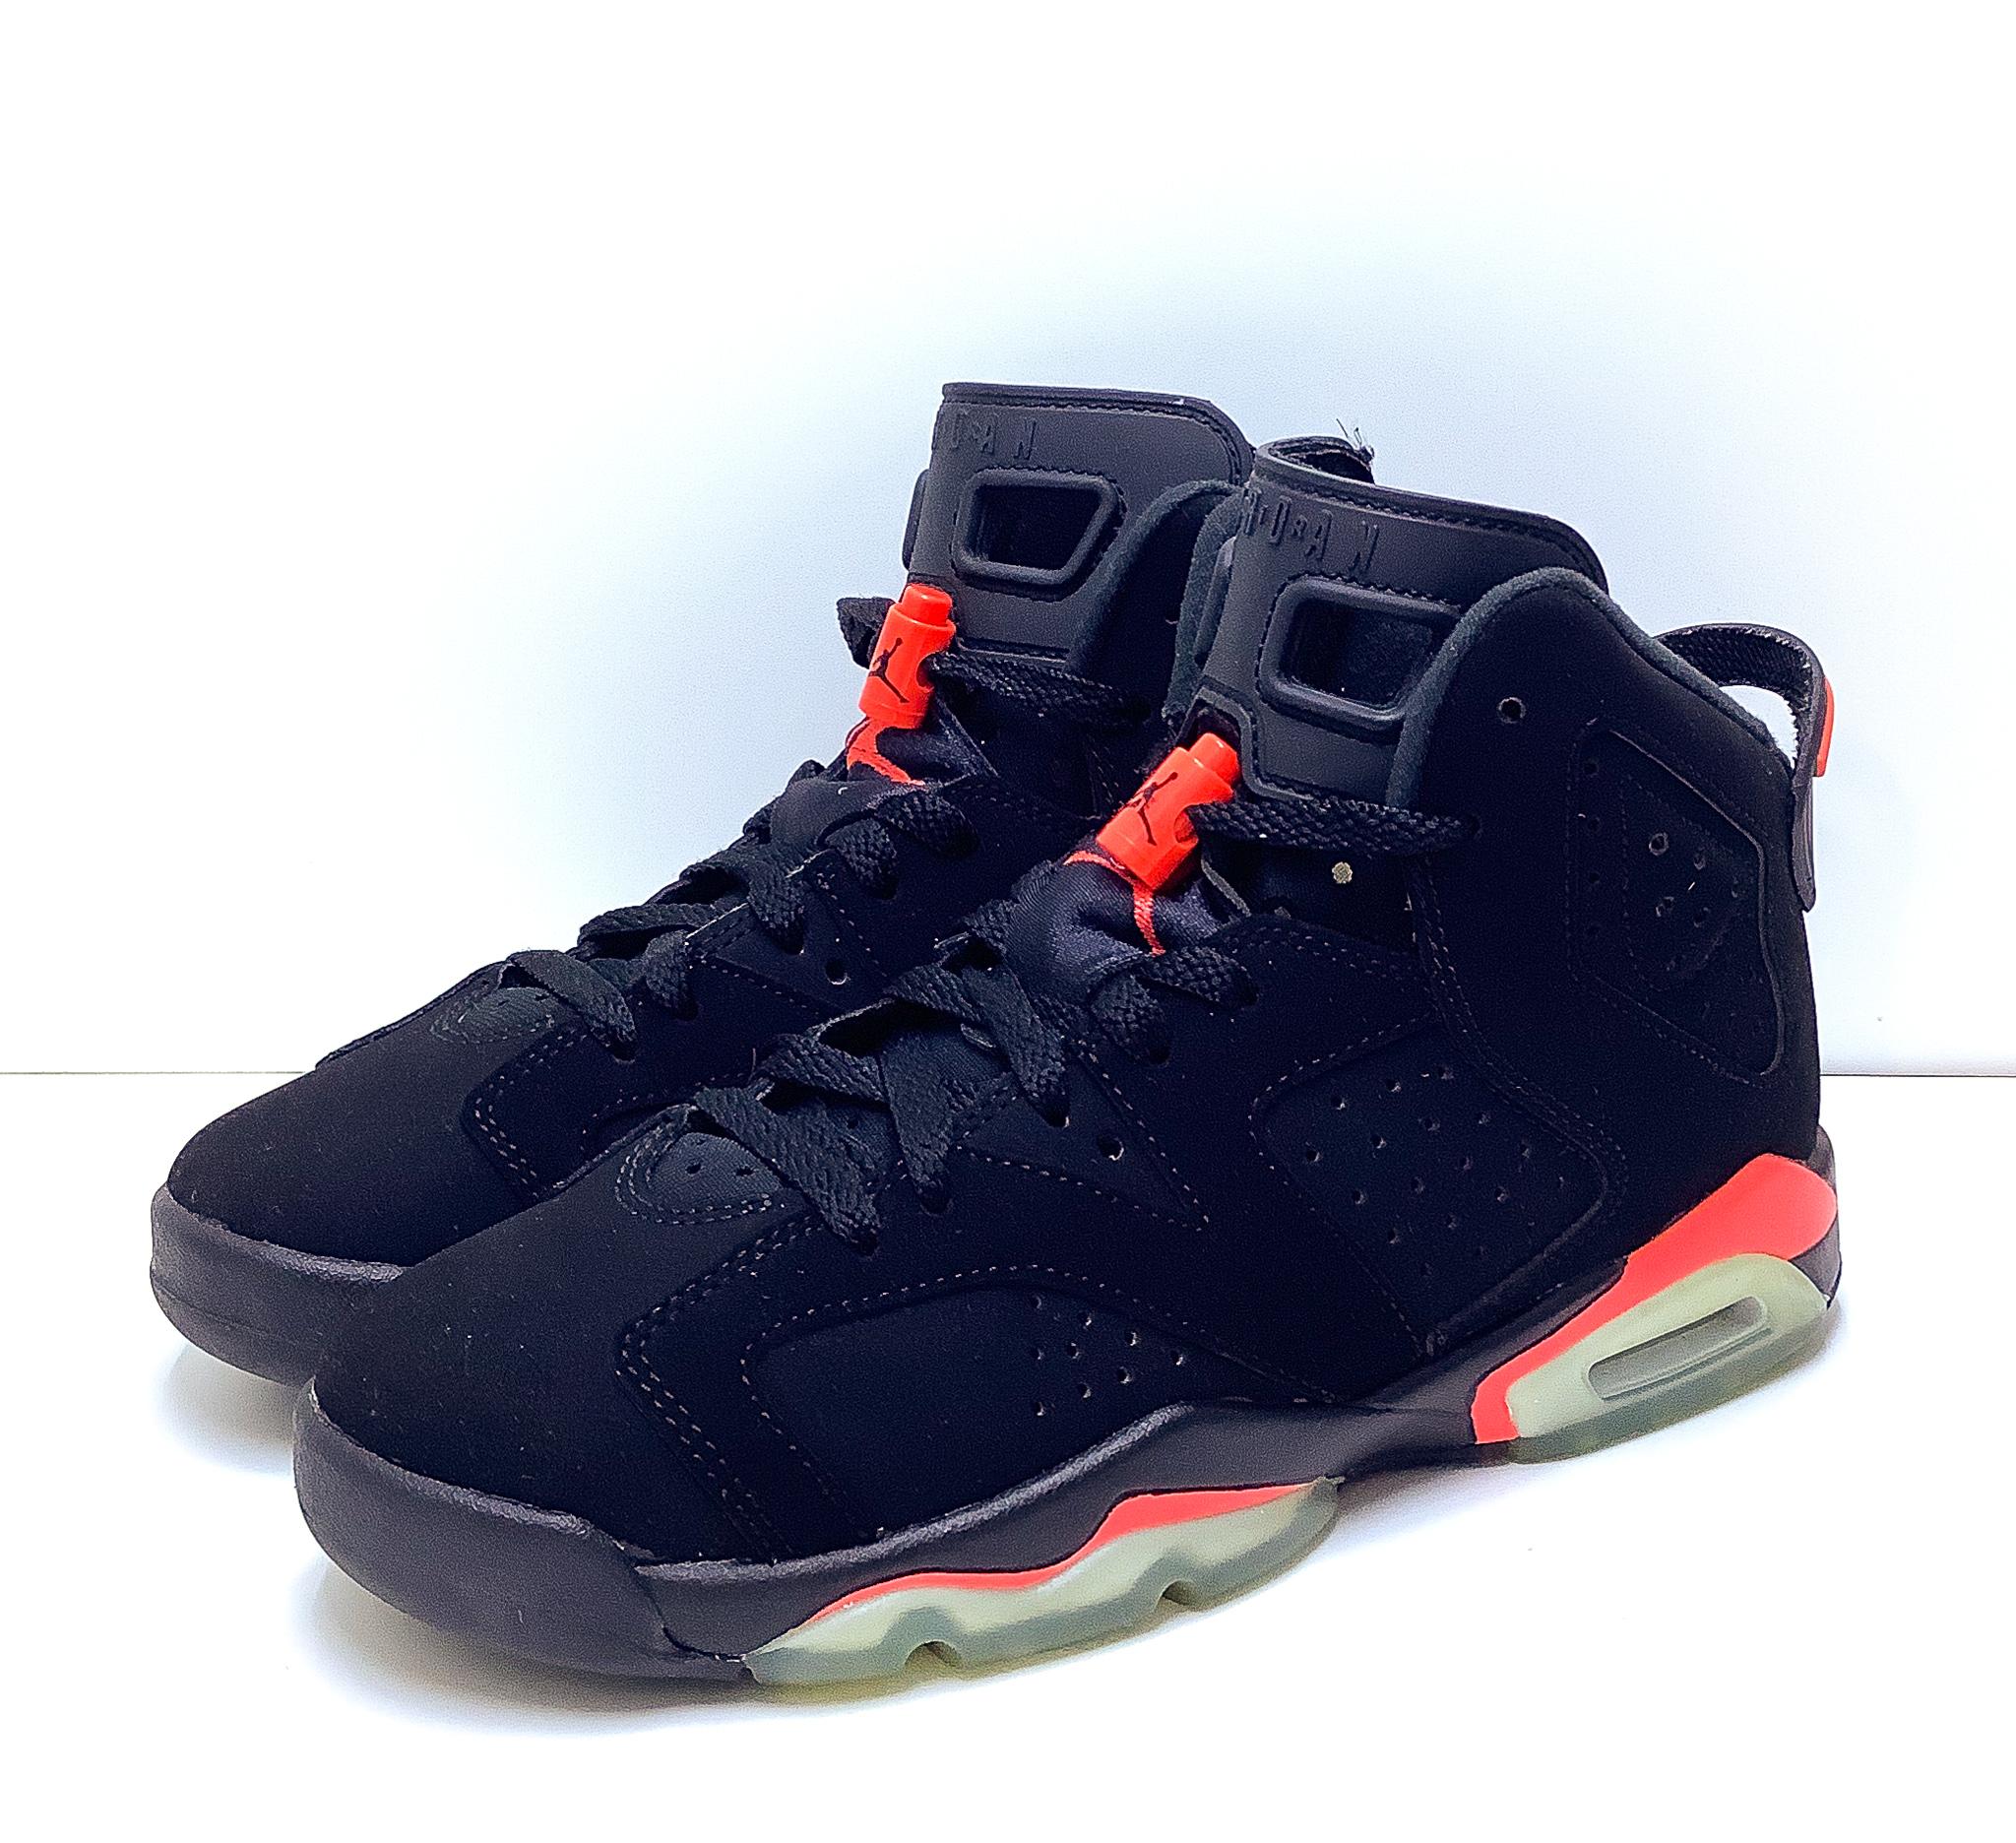 Jordan 6 infrared (GS)